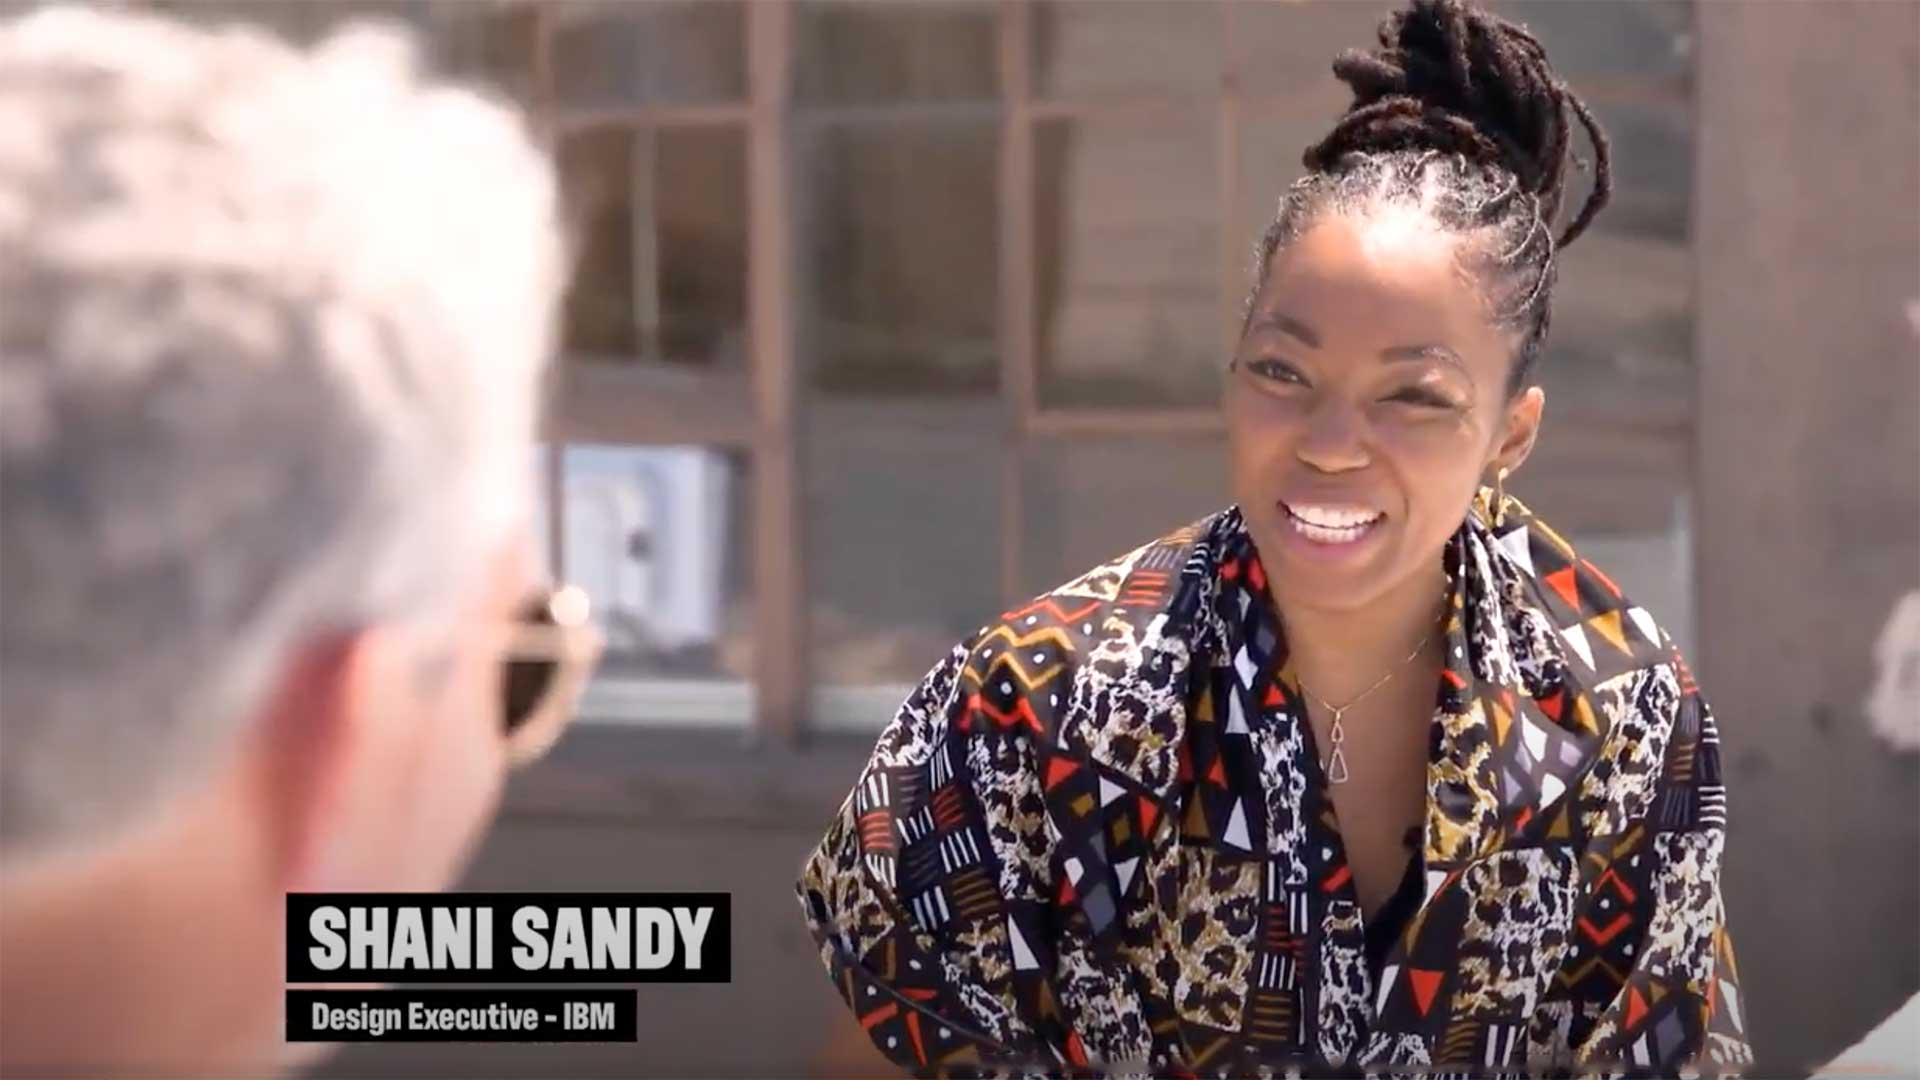 Get to Know Shani Sandi